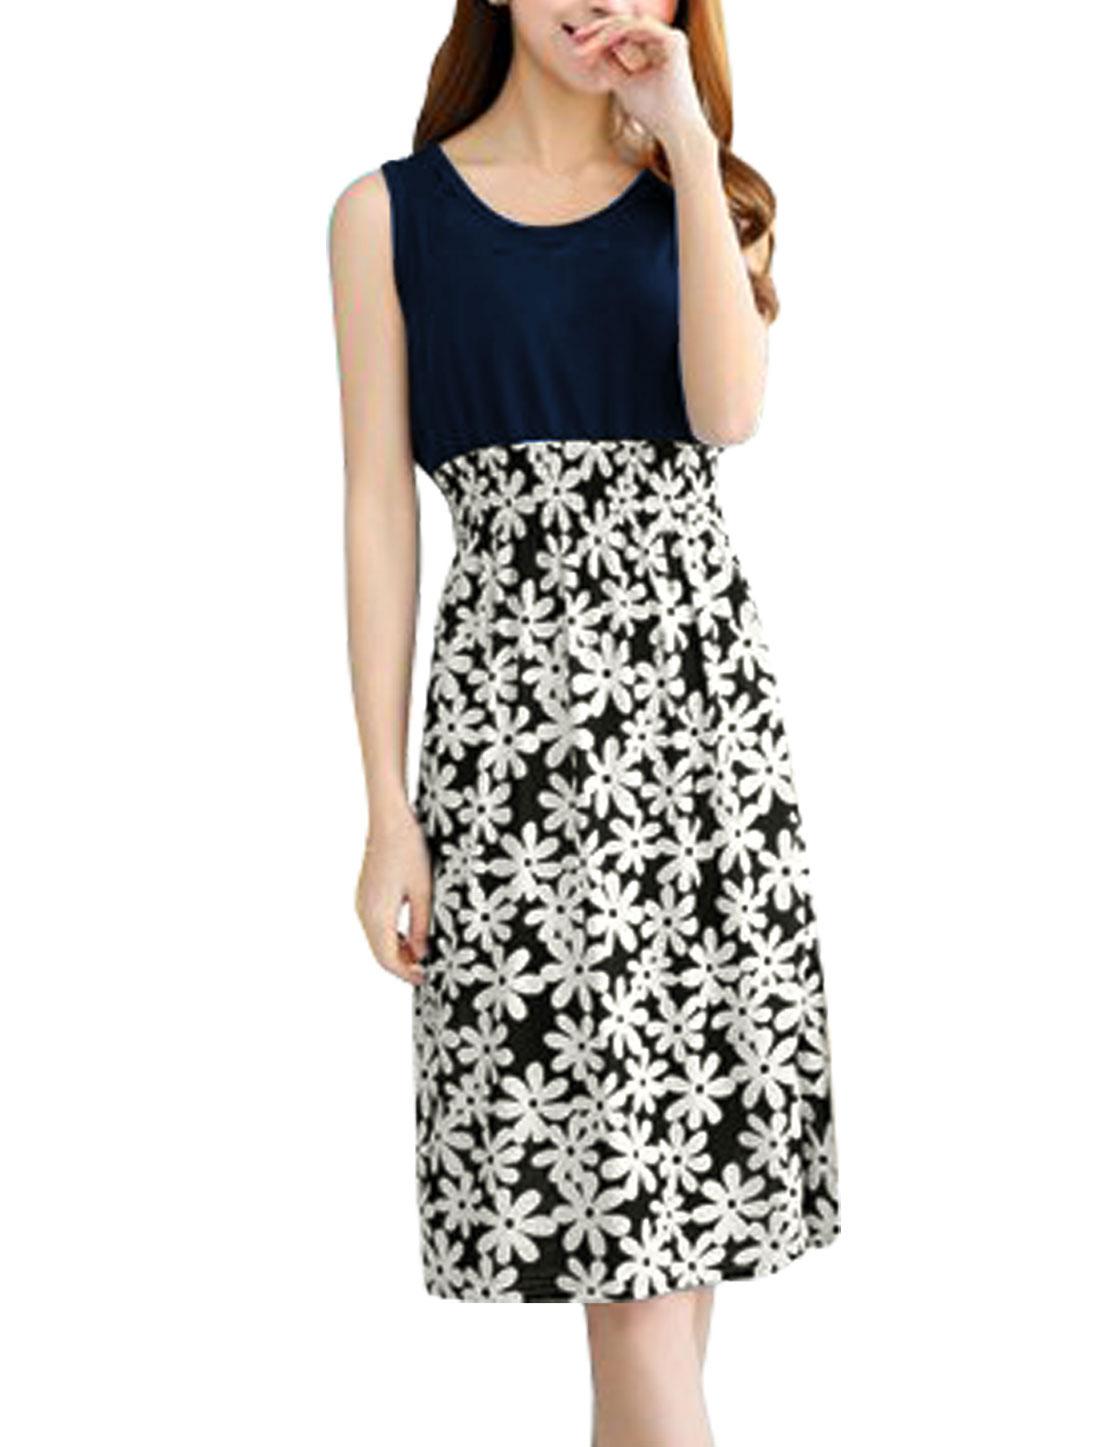 Women Round Neck Sleeveless Flower Prints Unlined Midi Dress Navy Blue Black XS